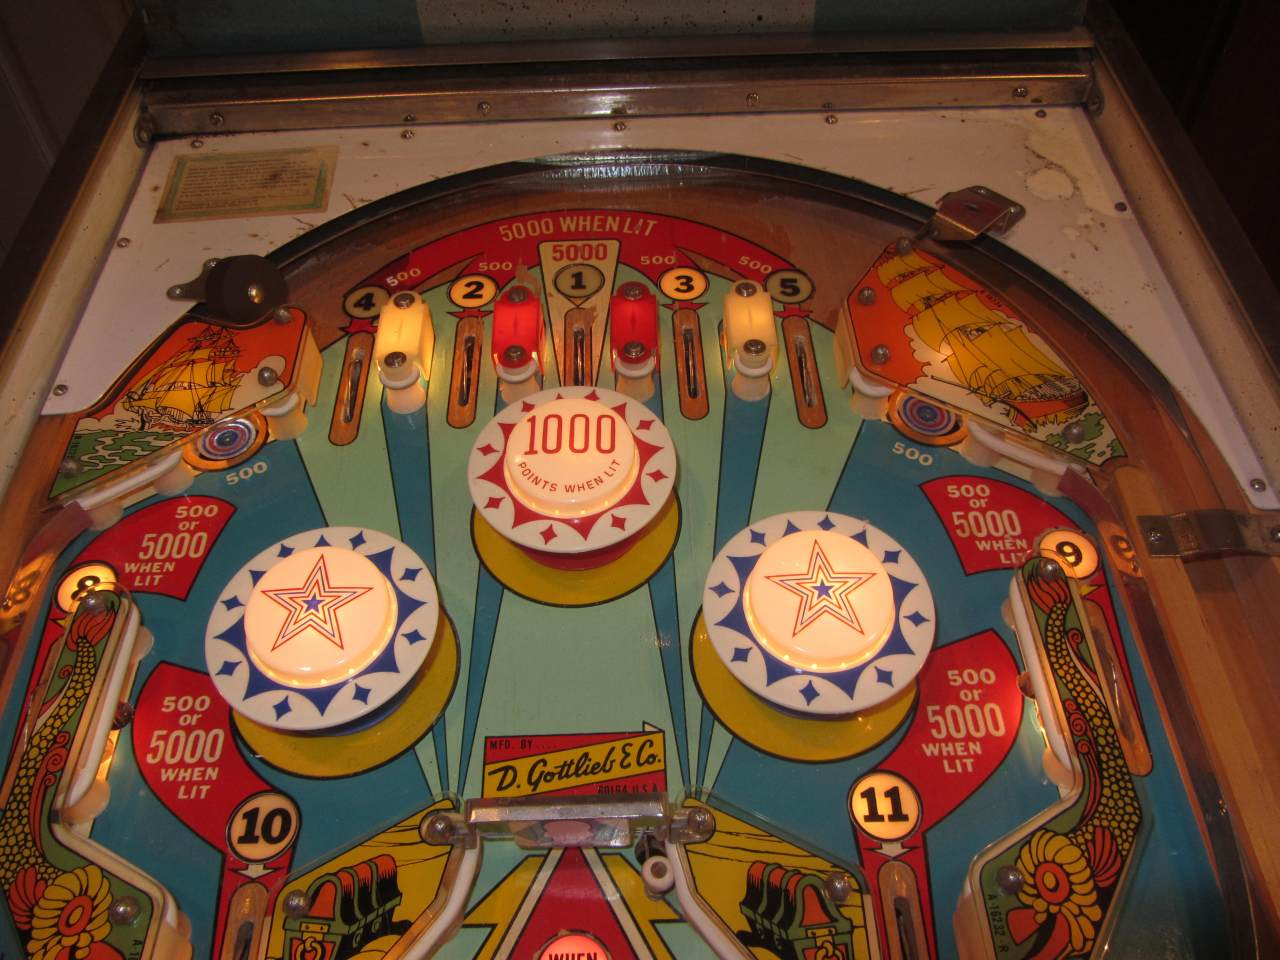 Gottlieb Buccaneer Pinball Machine 3 Pinballmania Llc